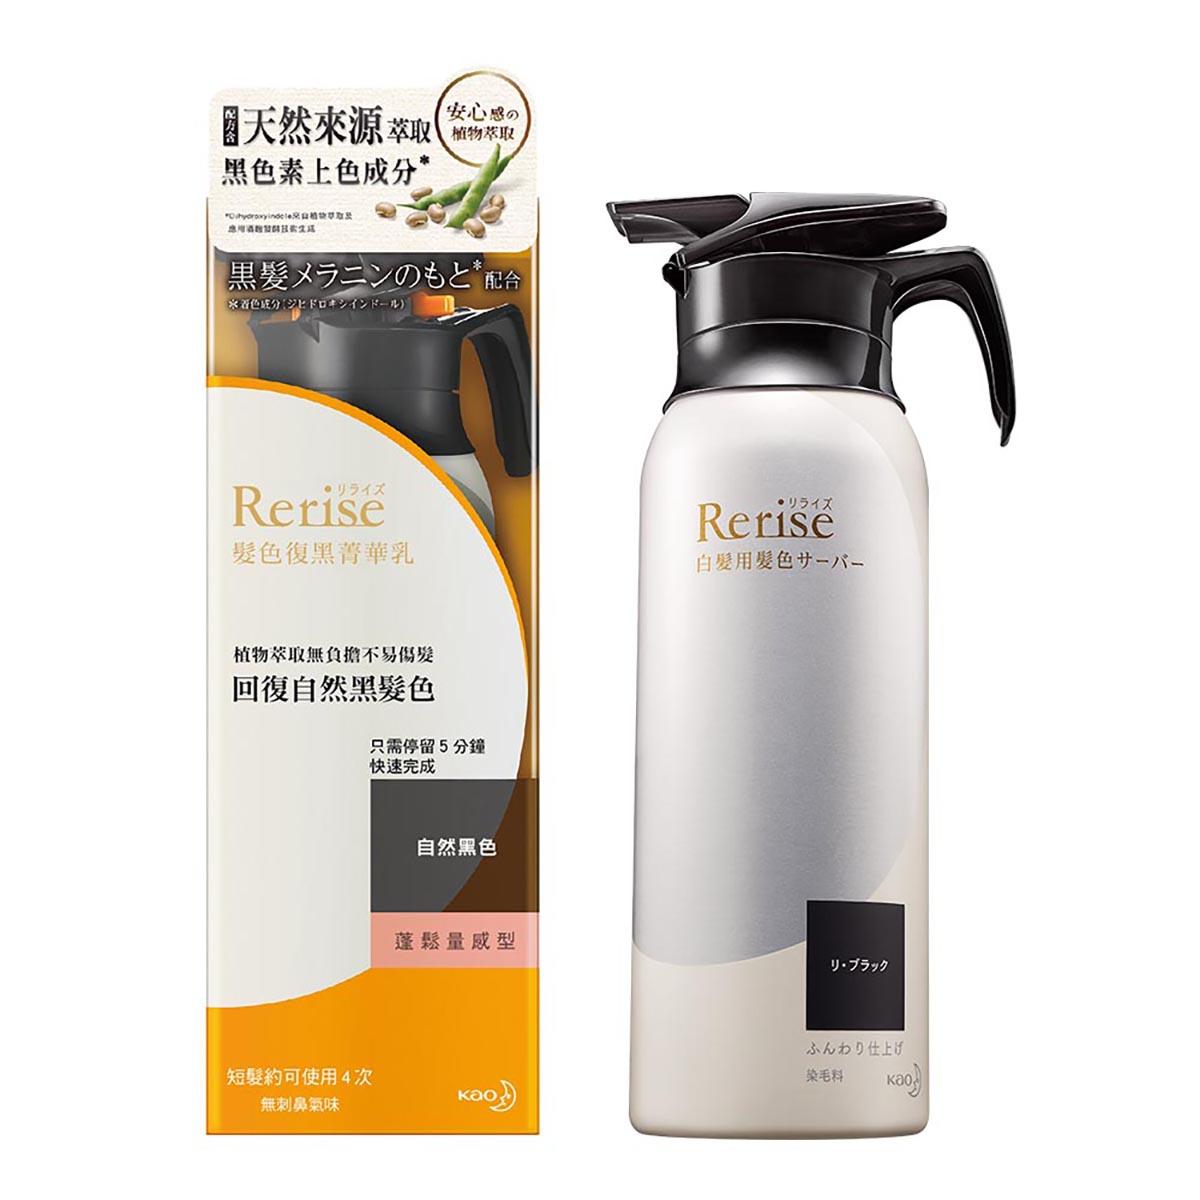 Rerise瑞絲髮色復黑菁華乳蓬鬆量感型自然黑155g